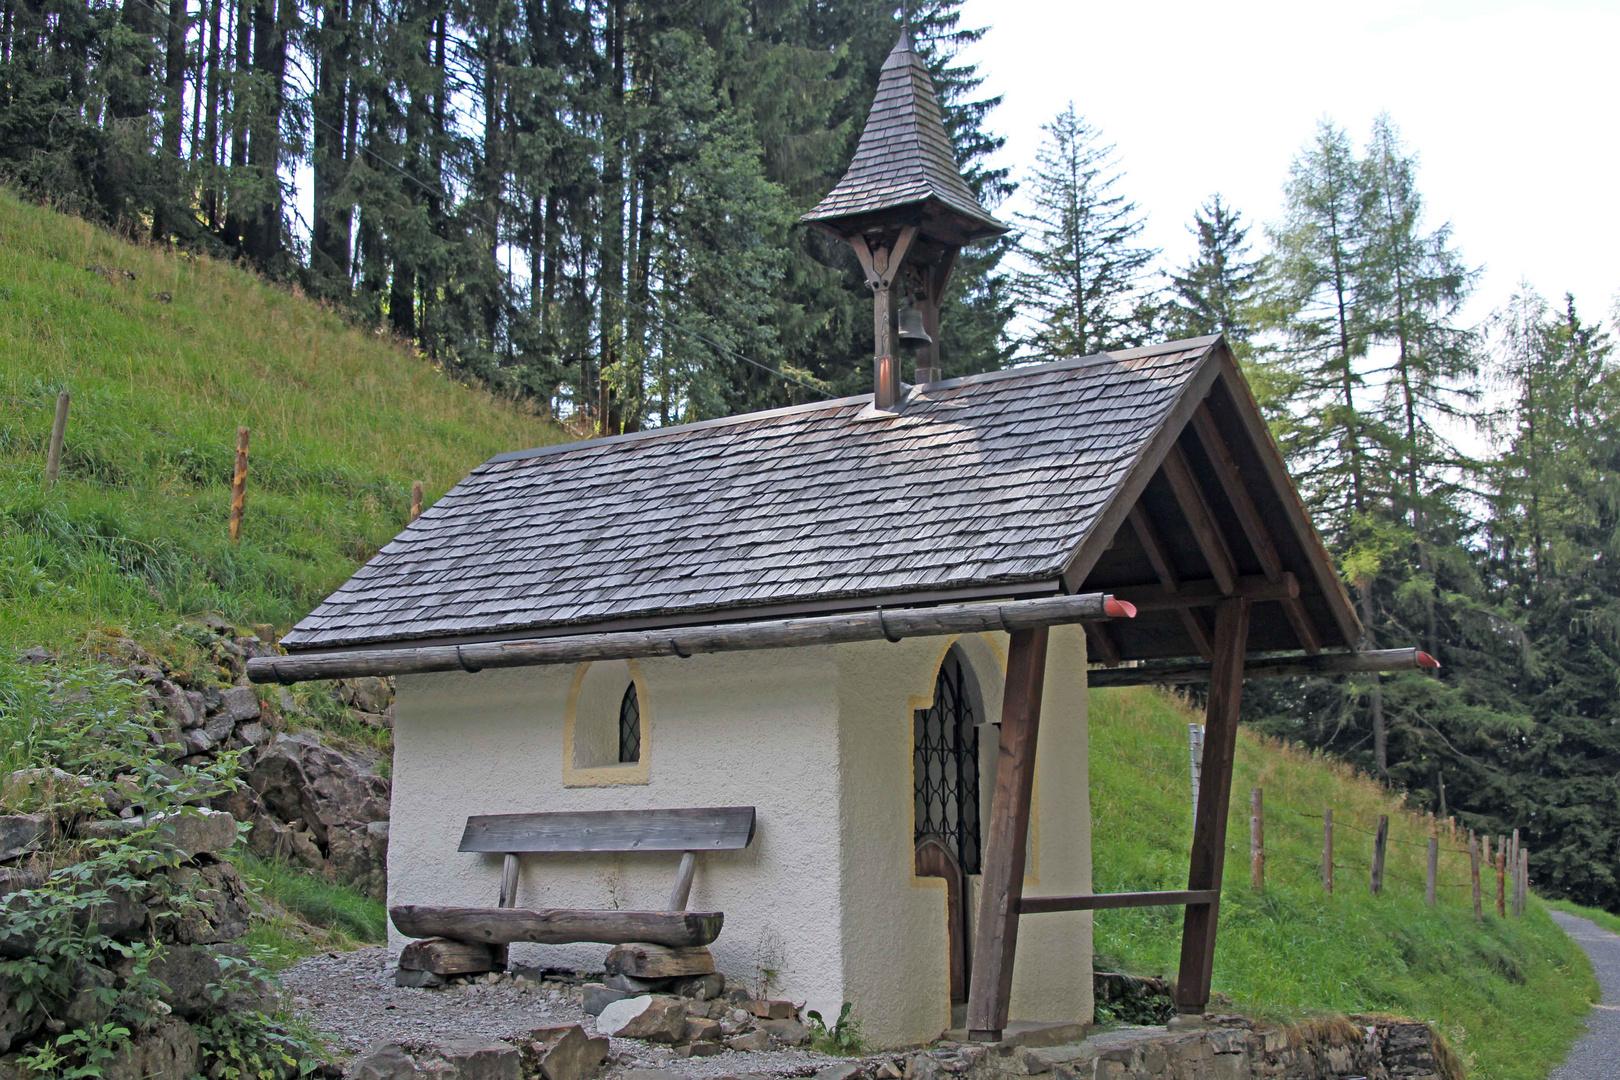 Kapelle am Wegrand in den Oberstdorfer Alpen